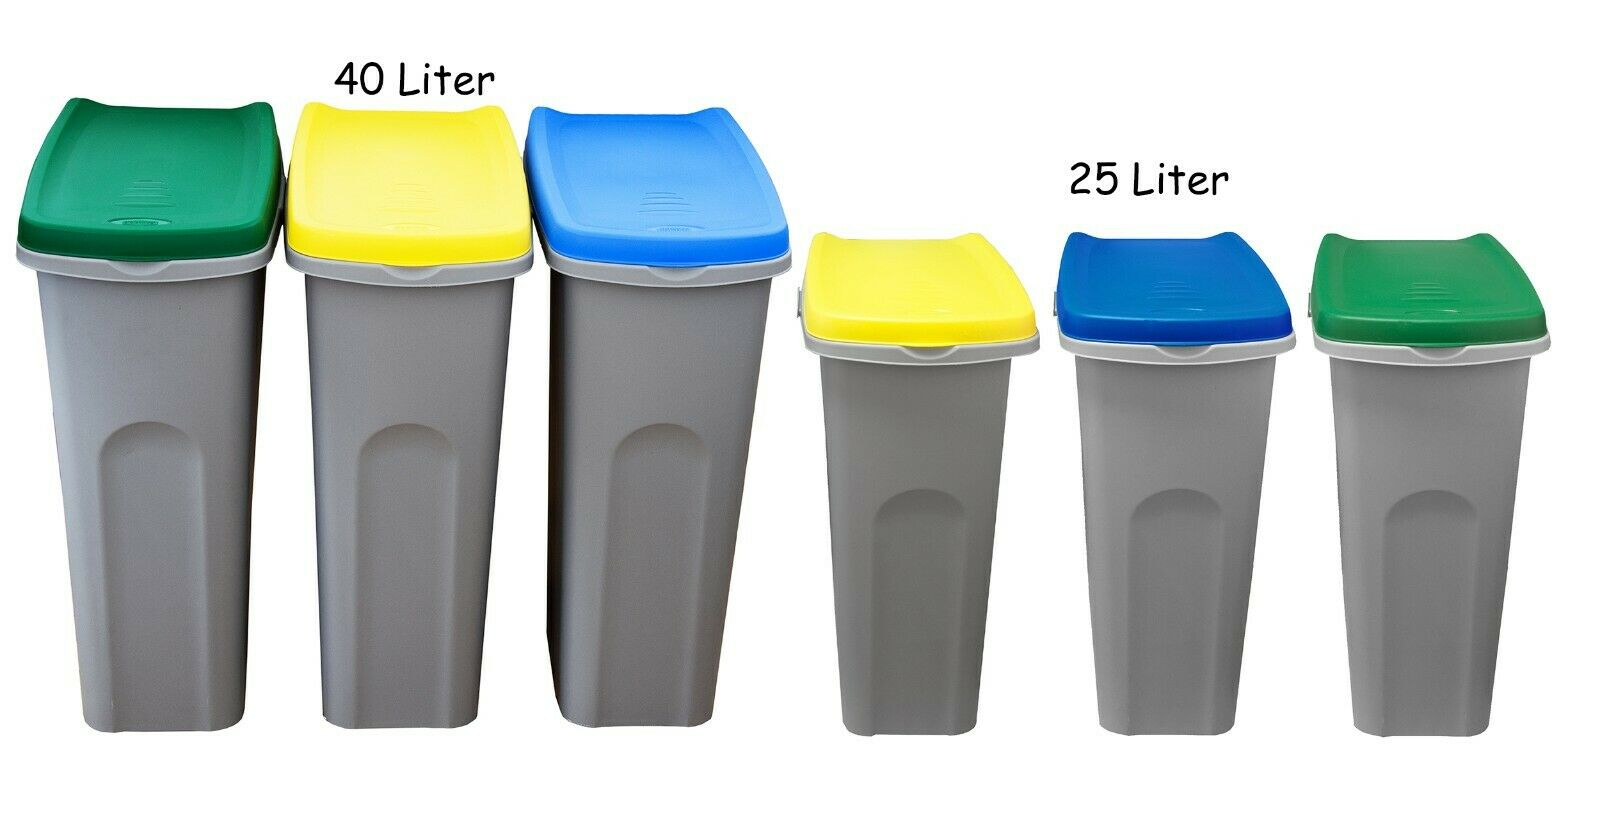 Mülleimer für Mülltrennung Mülltrennsystem Mülltrenner Sortierer Abfallsammler